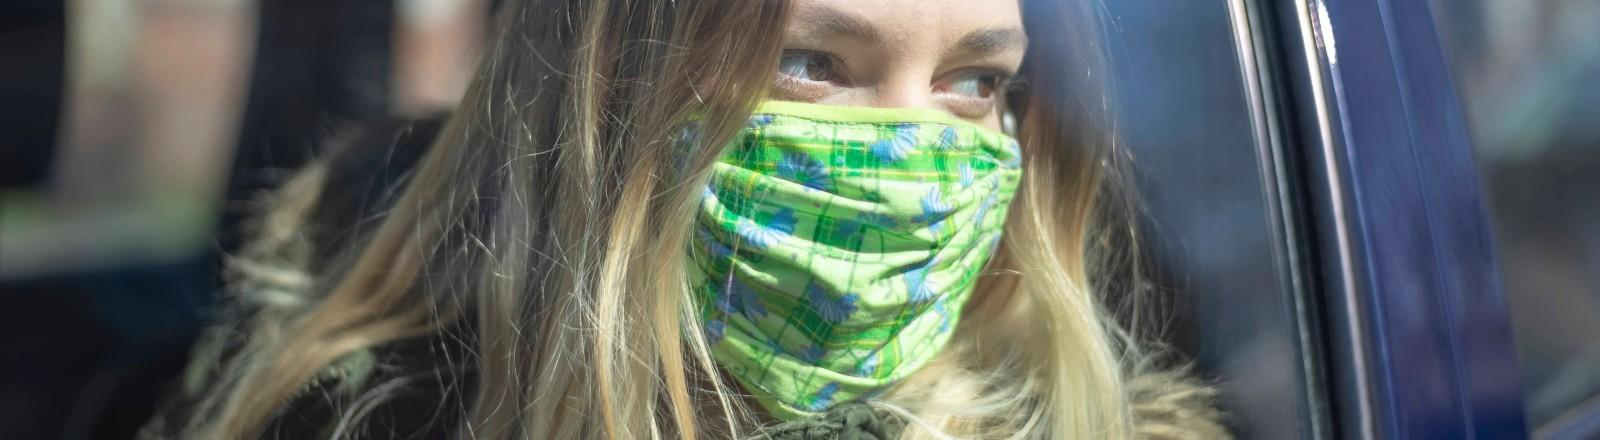 Junge Frau mit Maske im Auto